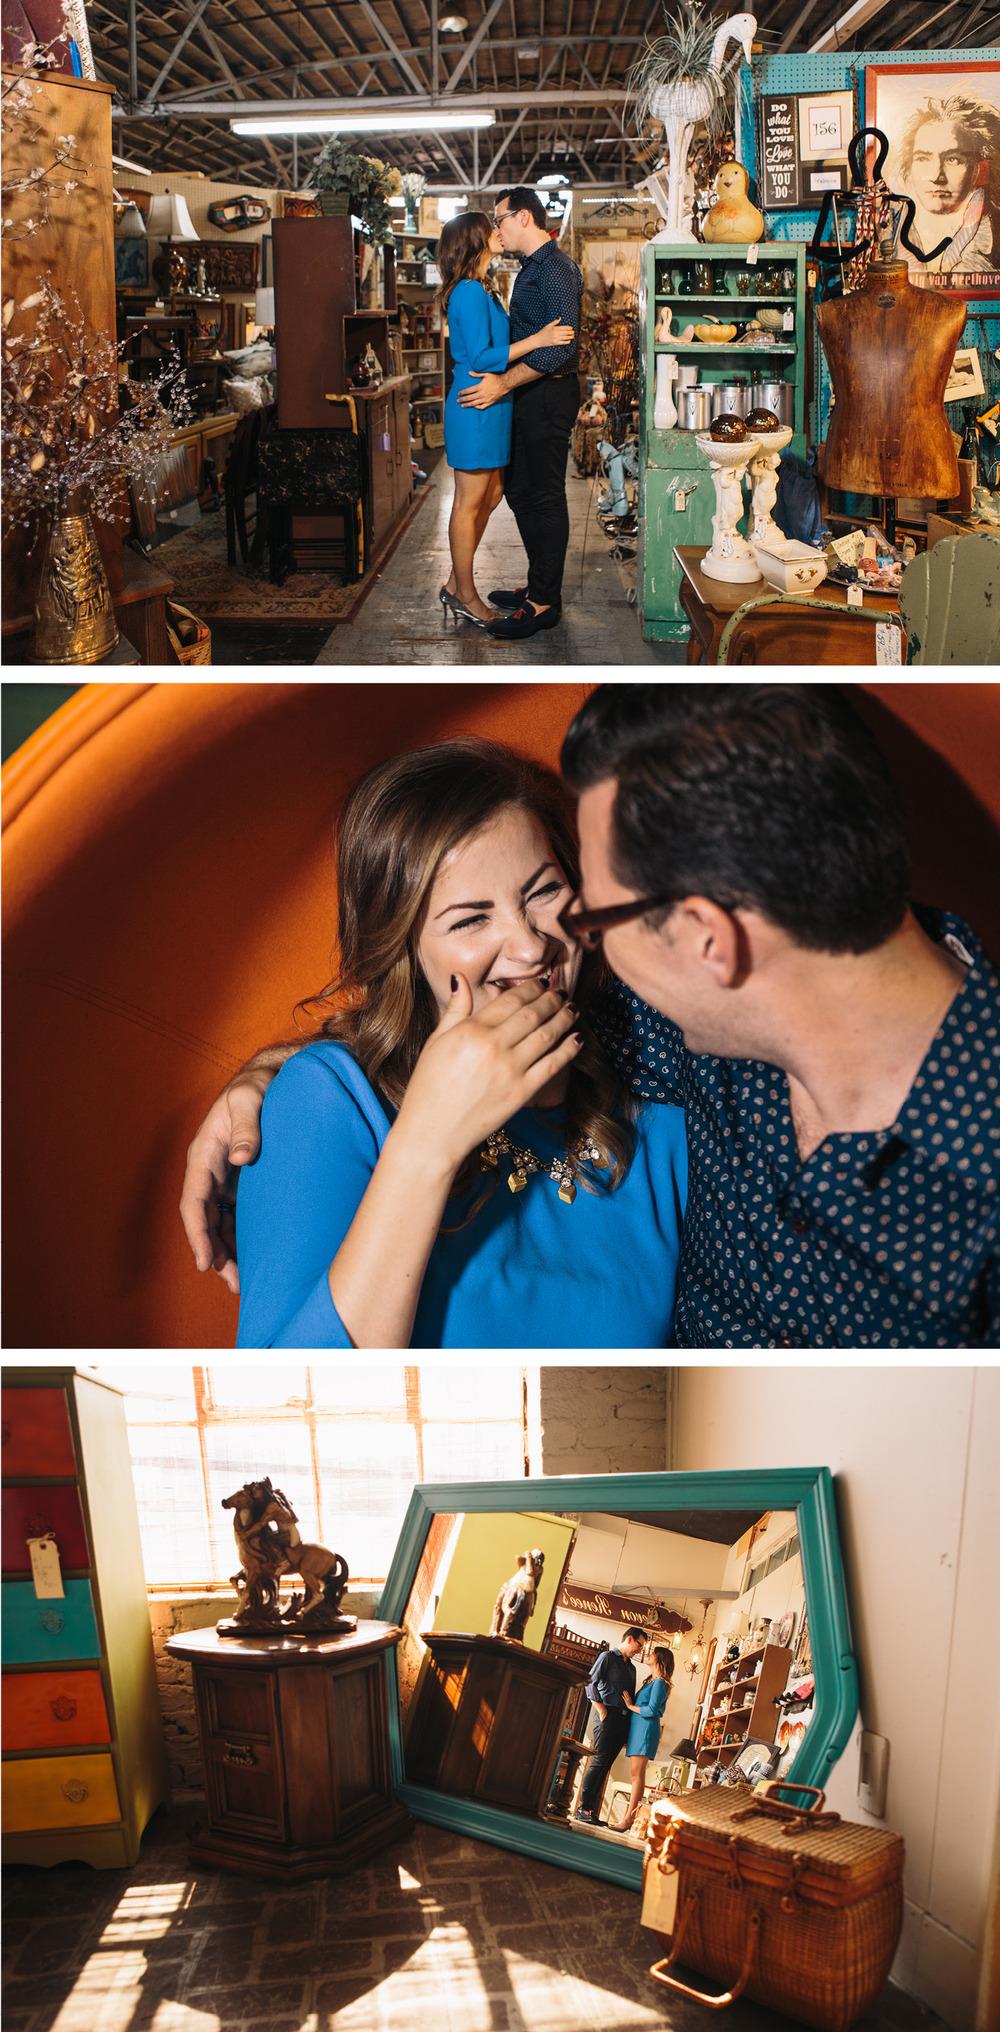 CK-Photo-Nashville-Wedding-Photographer-DL2.jpg